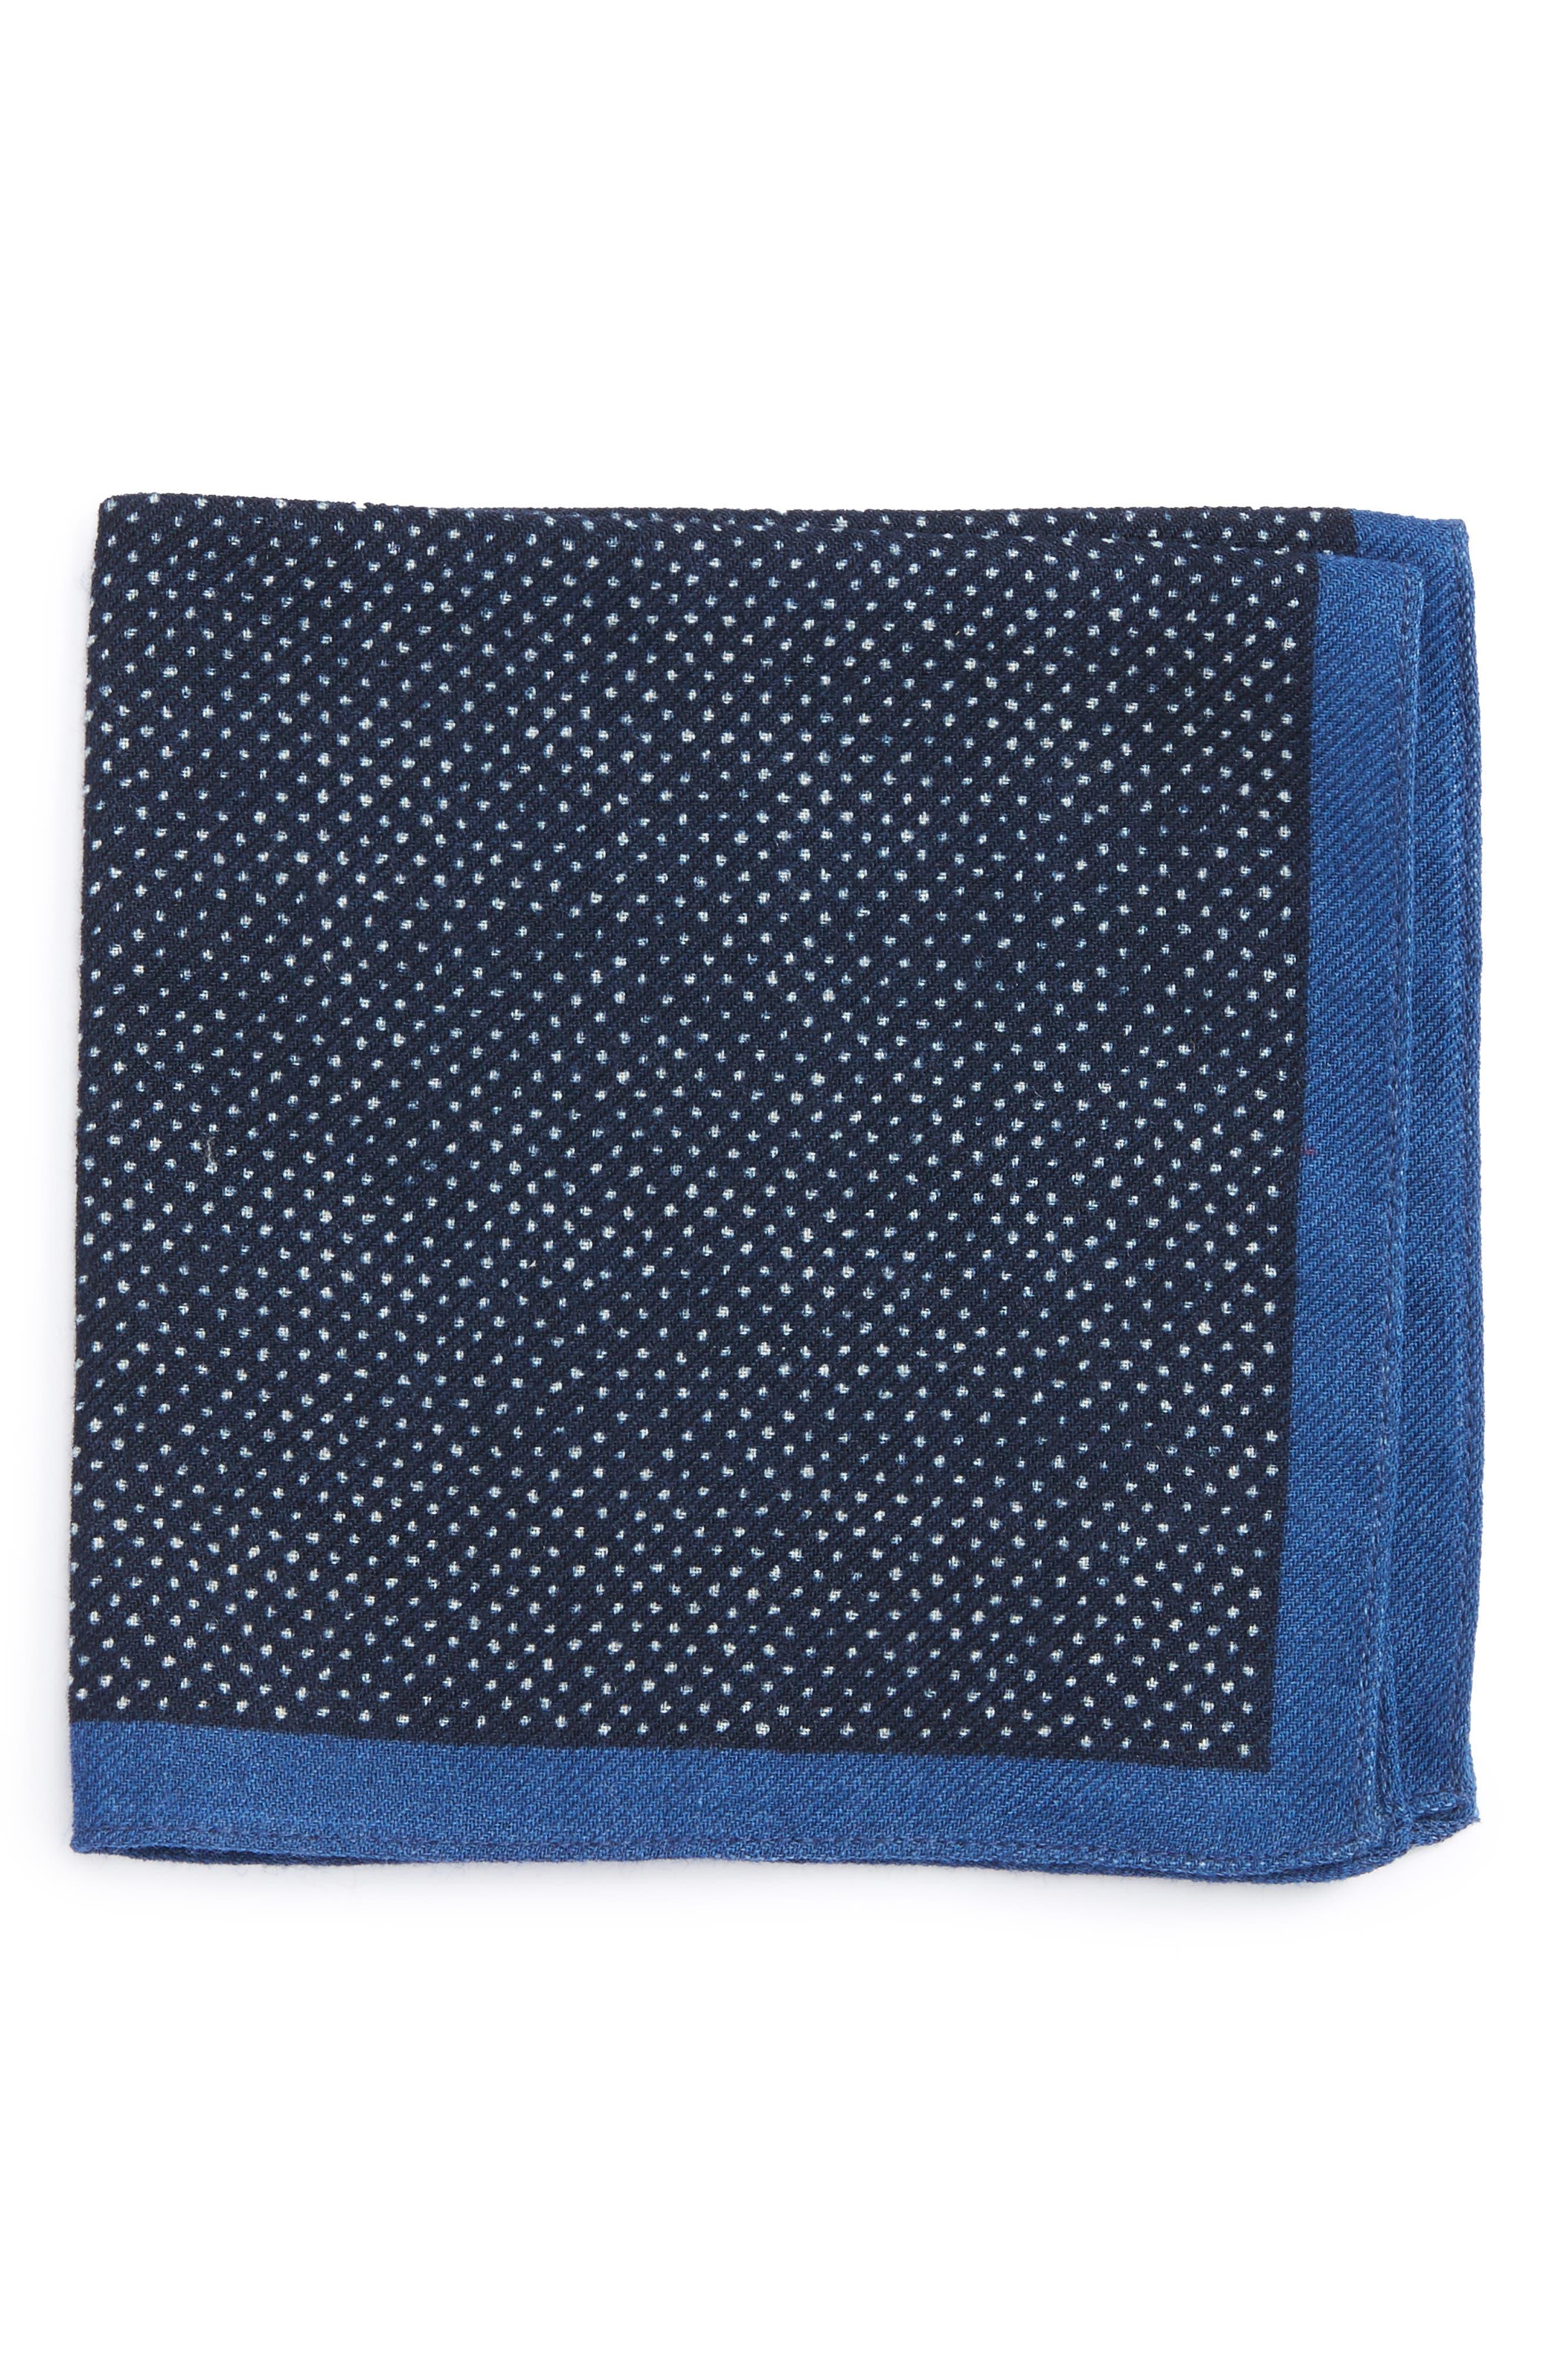 Dot Wool Pocket Square,                         Main,                         color, 411